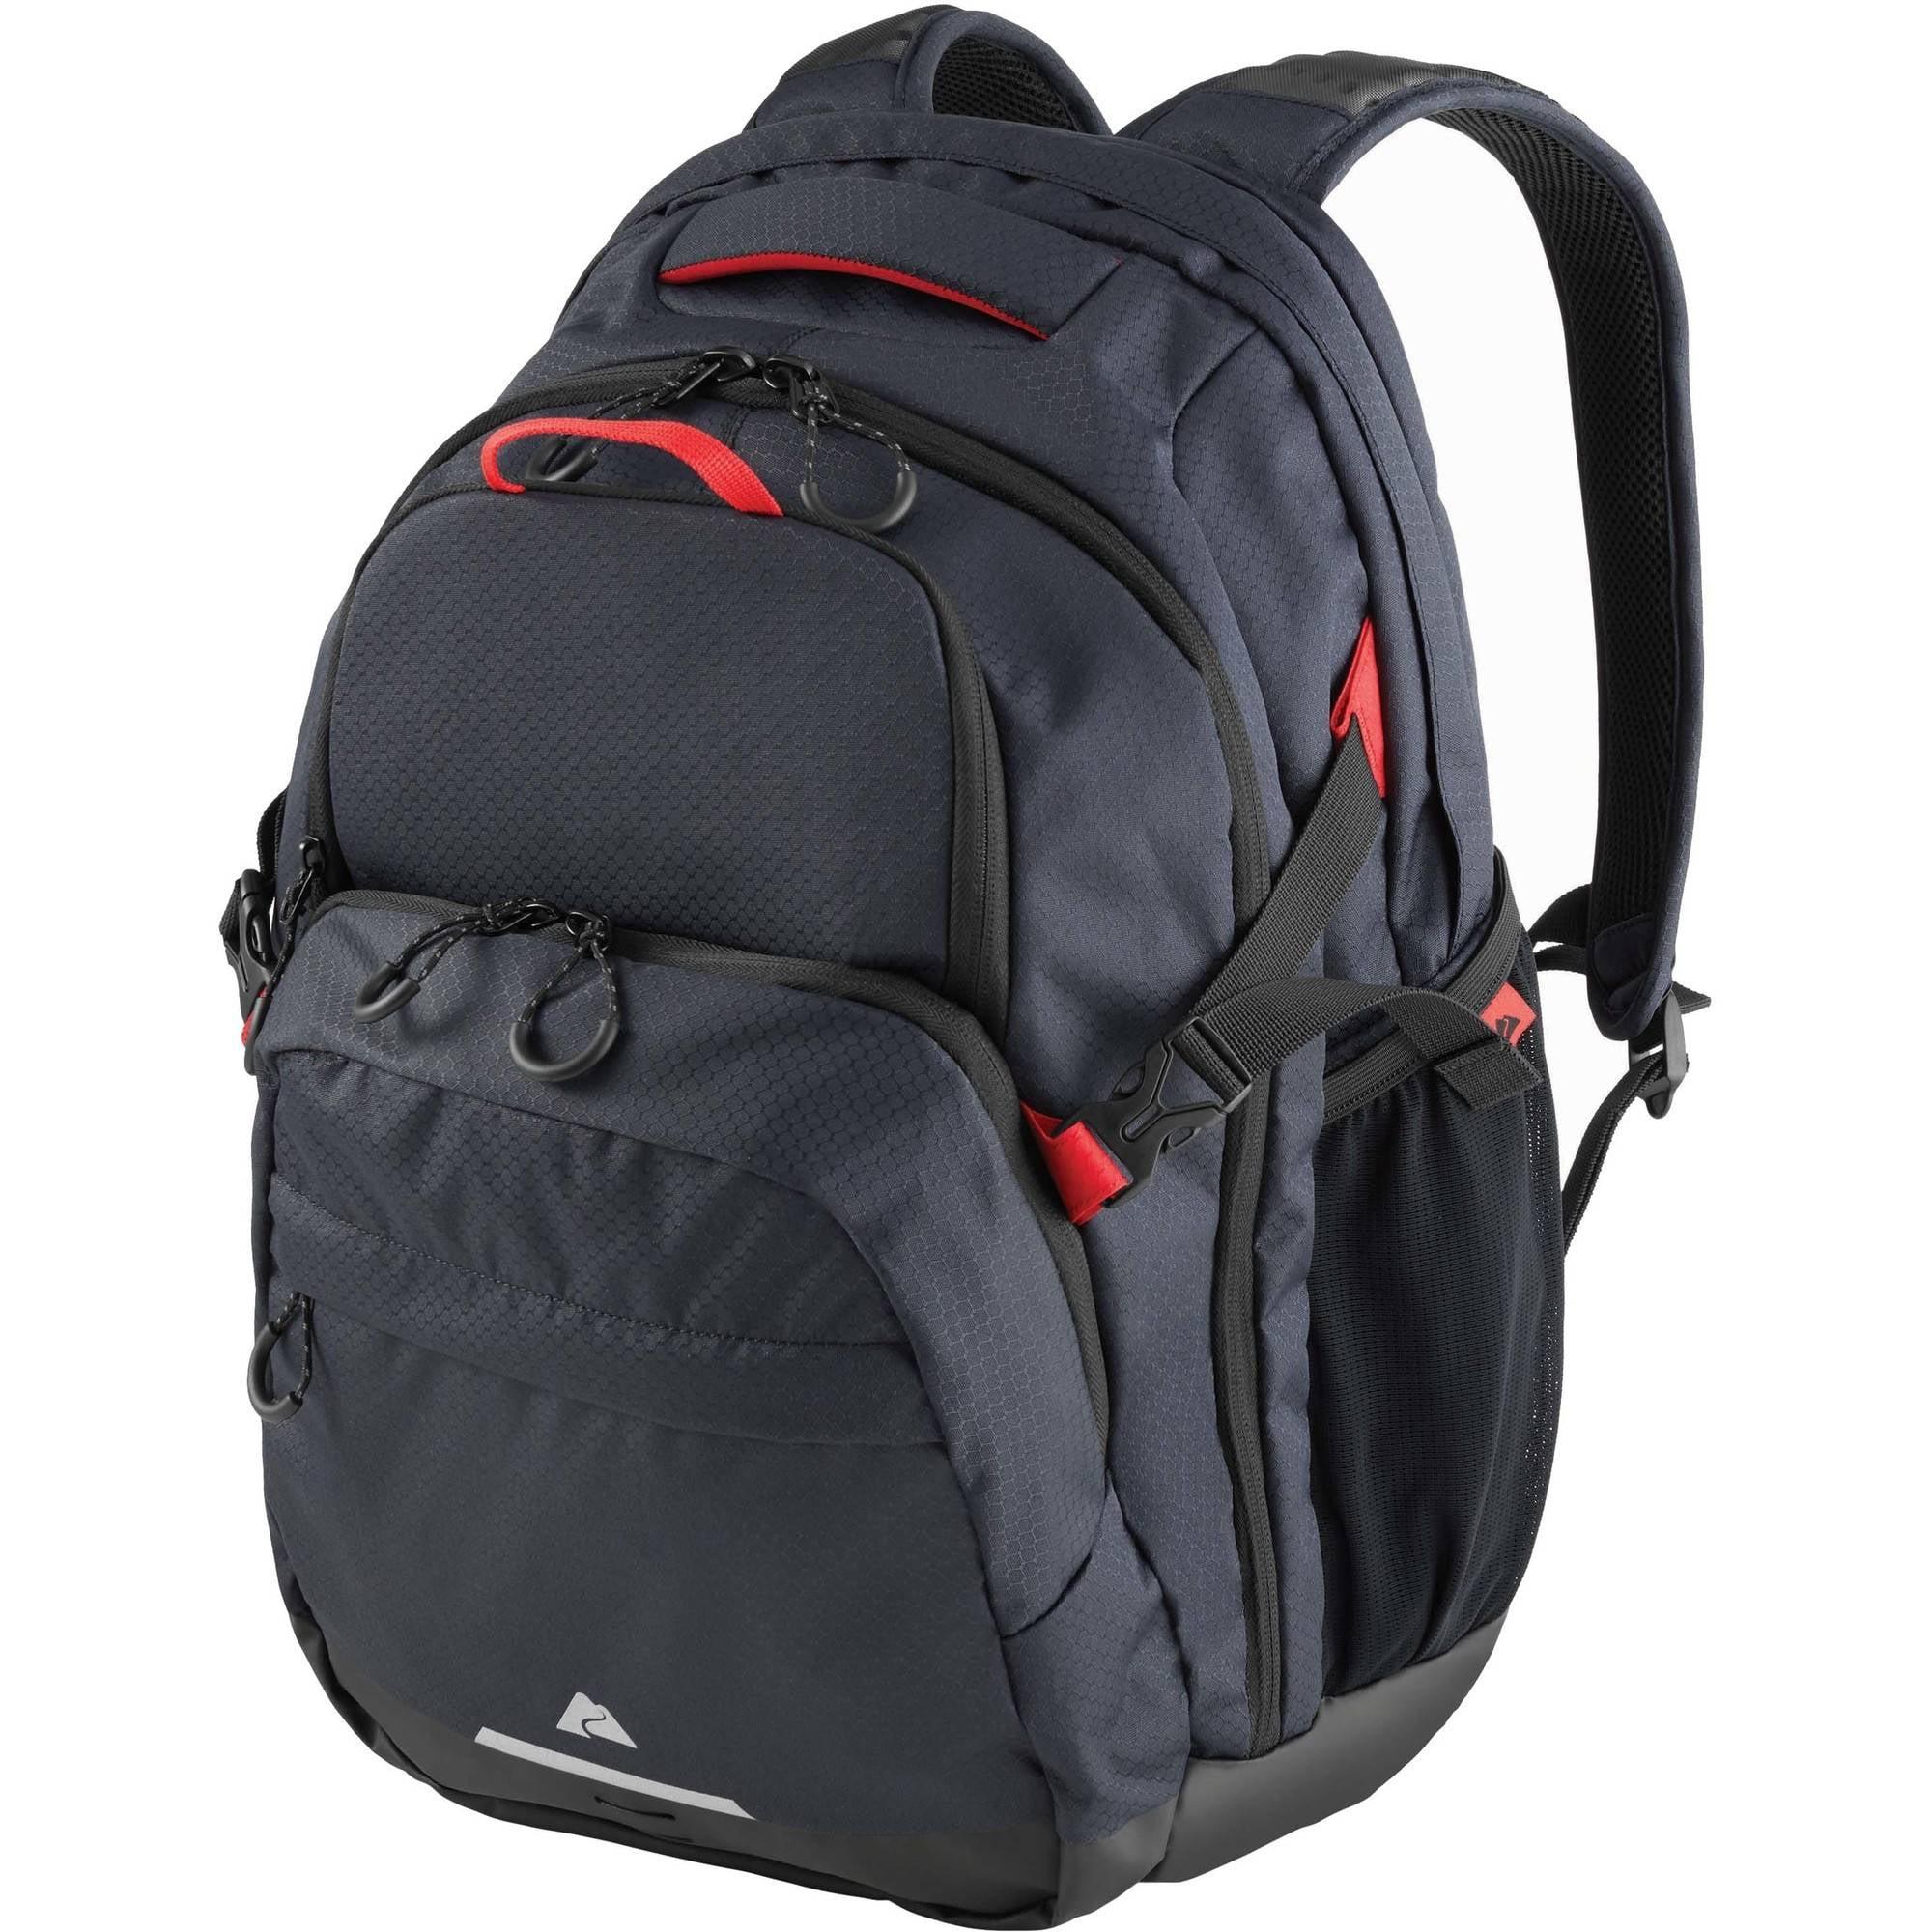 Ozark Trail Fremont Daypack by EUSEBIO SPORTING CO.,LTD